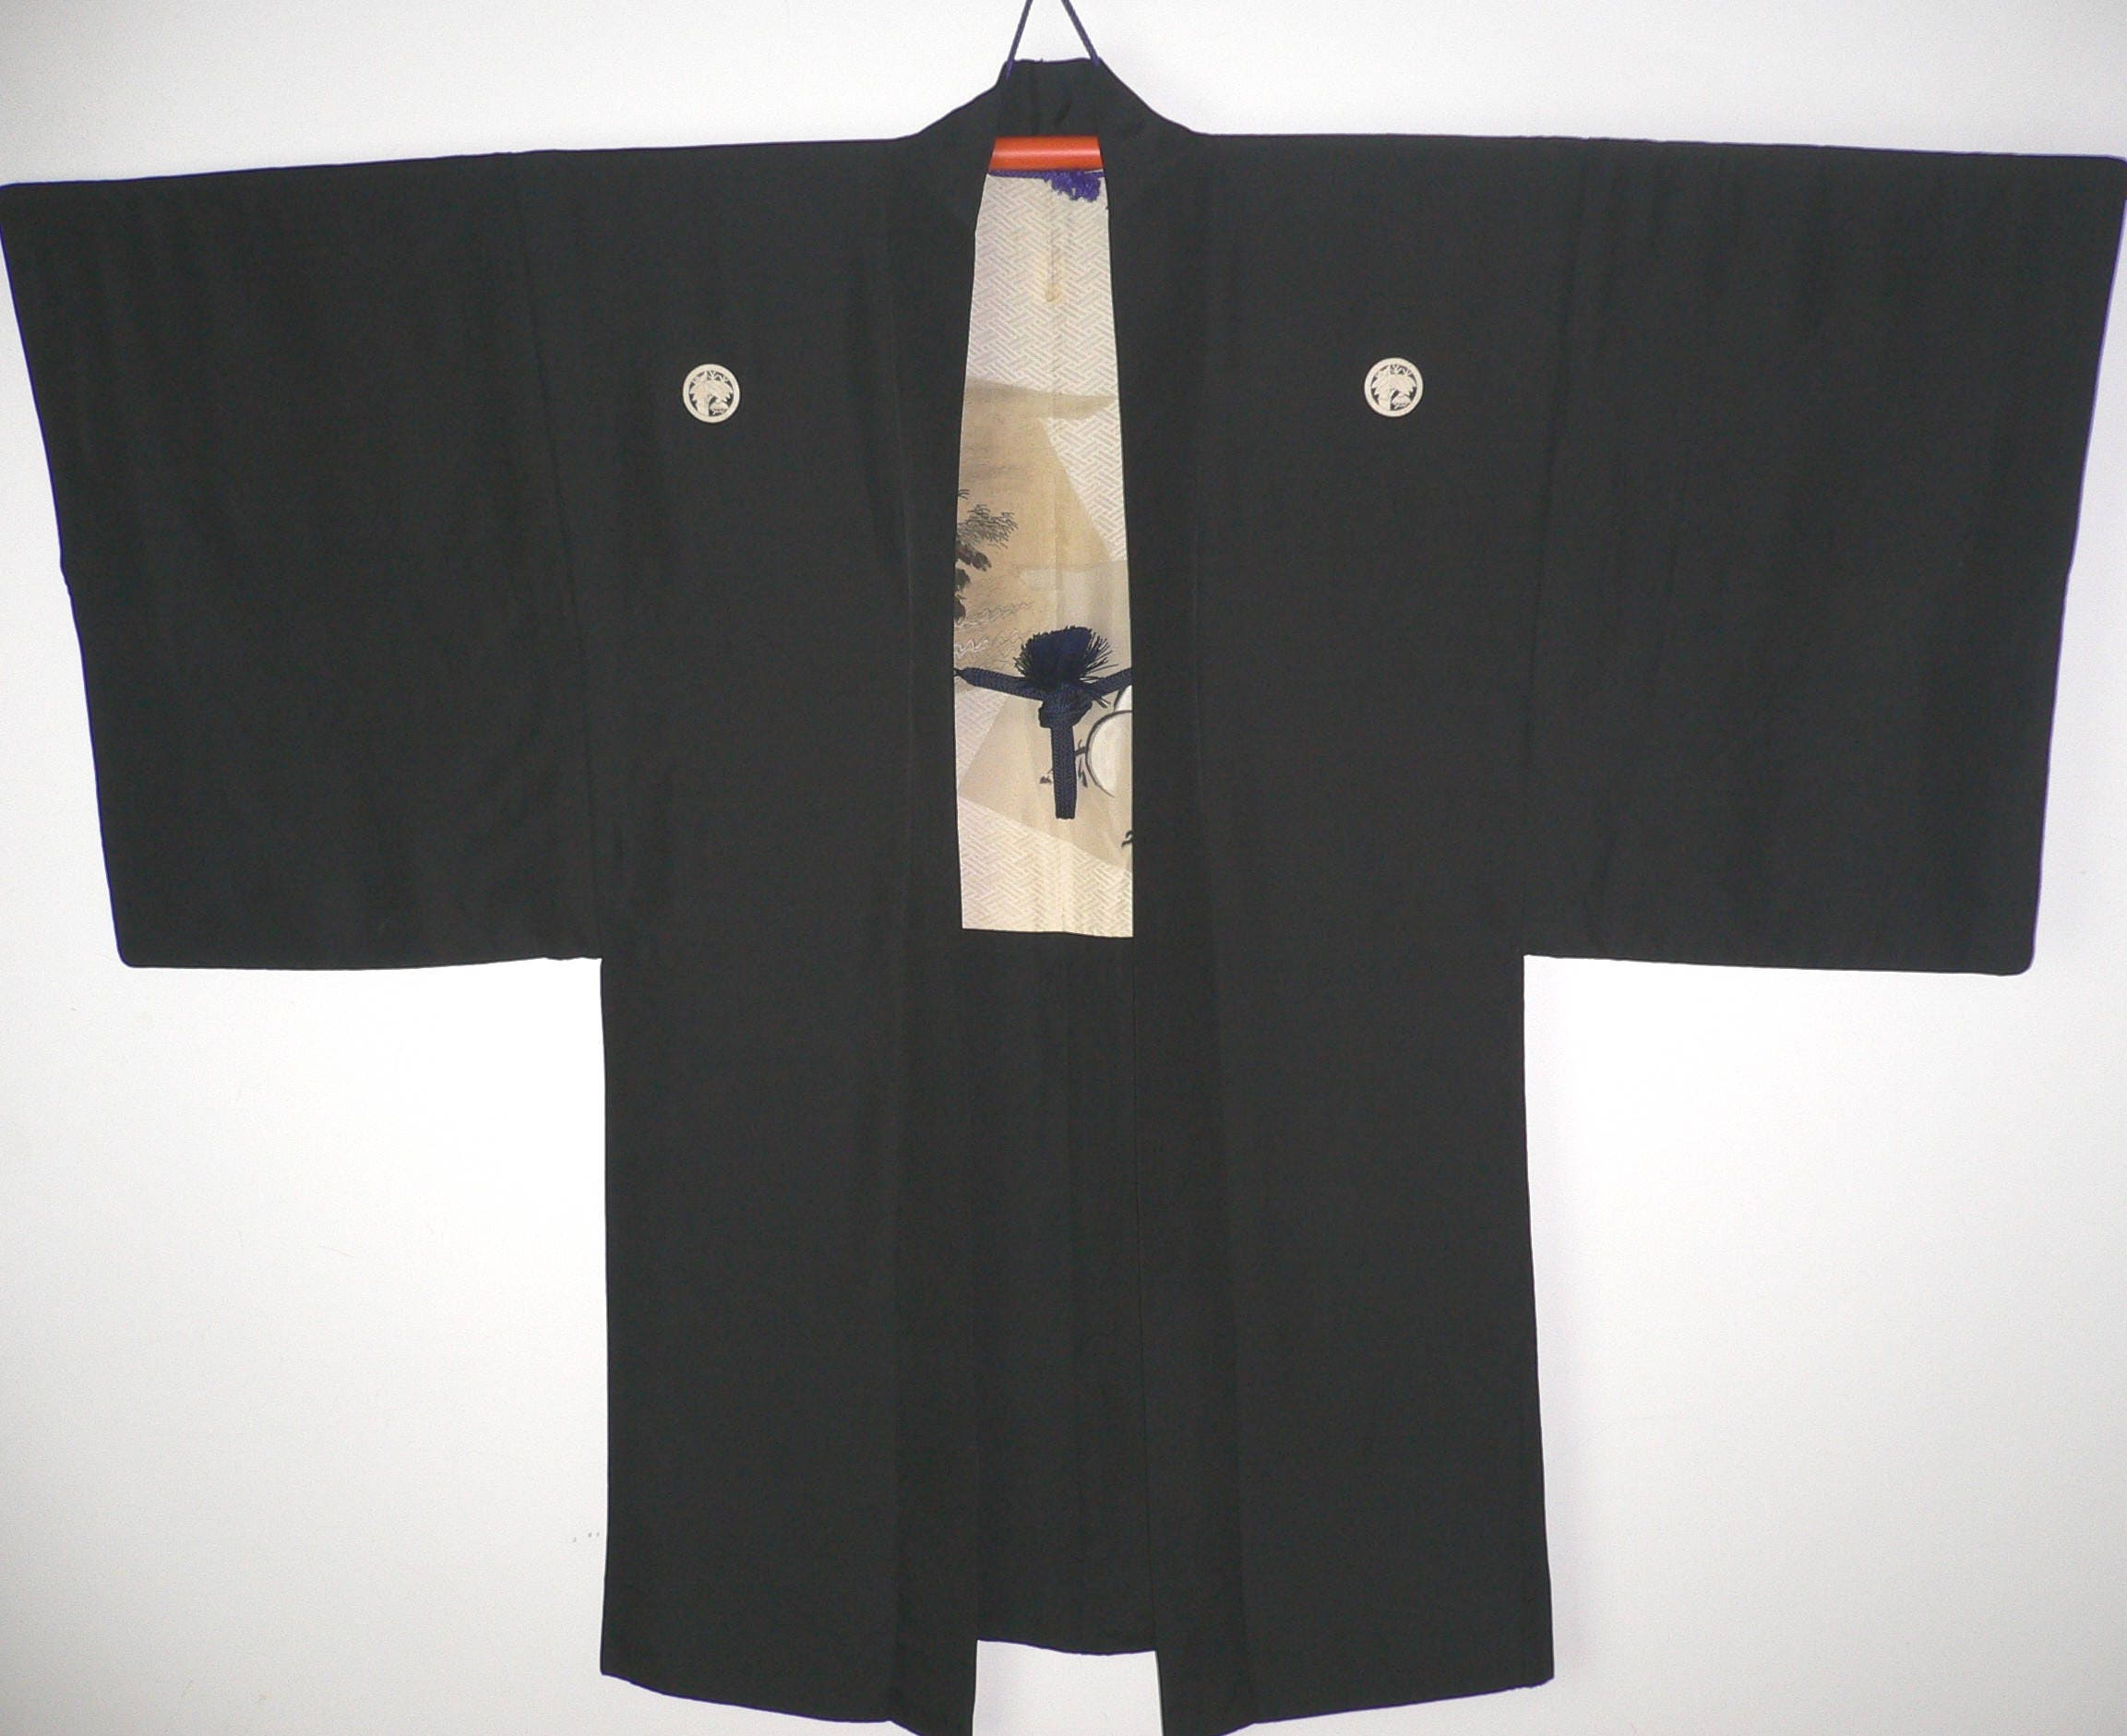 Rare Japanese Mens Black Silk Formal Haori Jacket Kimono with Artwork Lining showing Ema Wishing Plaques Horse Scenery  HImo Cords